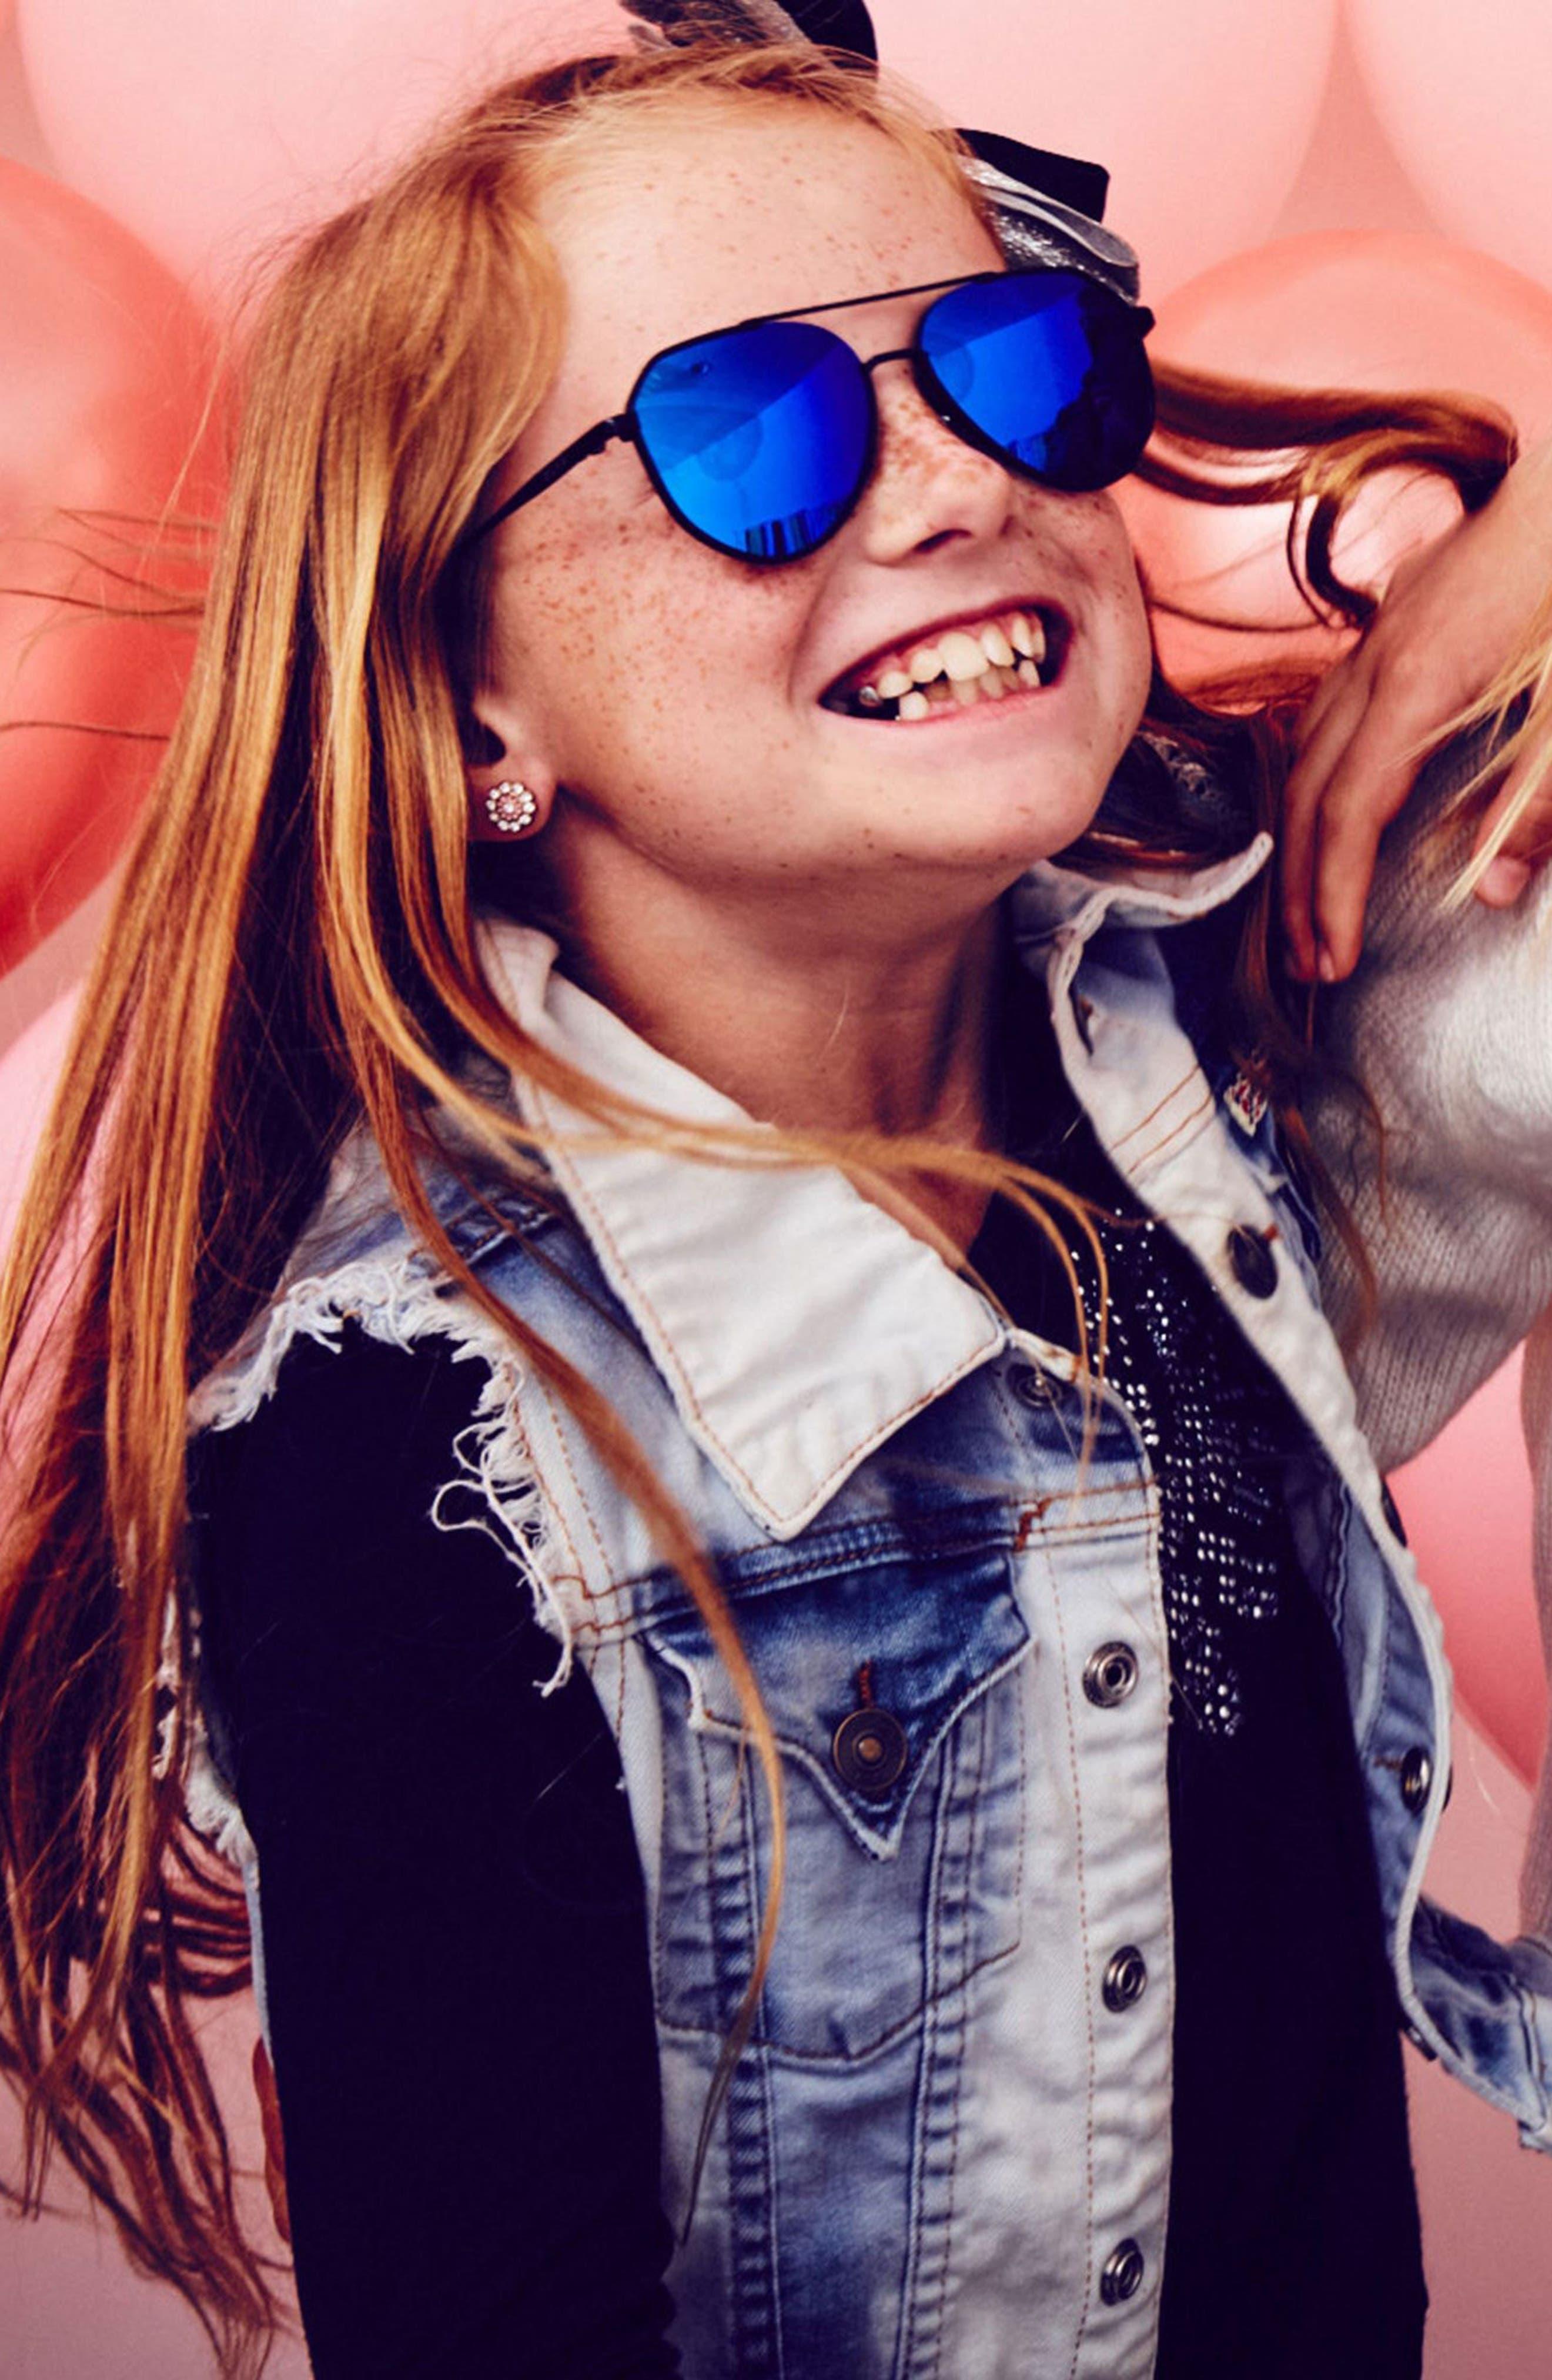 Mommy & Me Dash 2-Pack Aviator Sunglasses,                             Alternate thumbnail 5, color,                             003